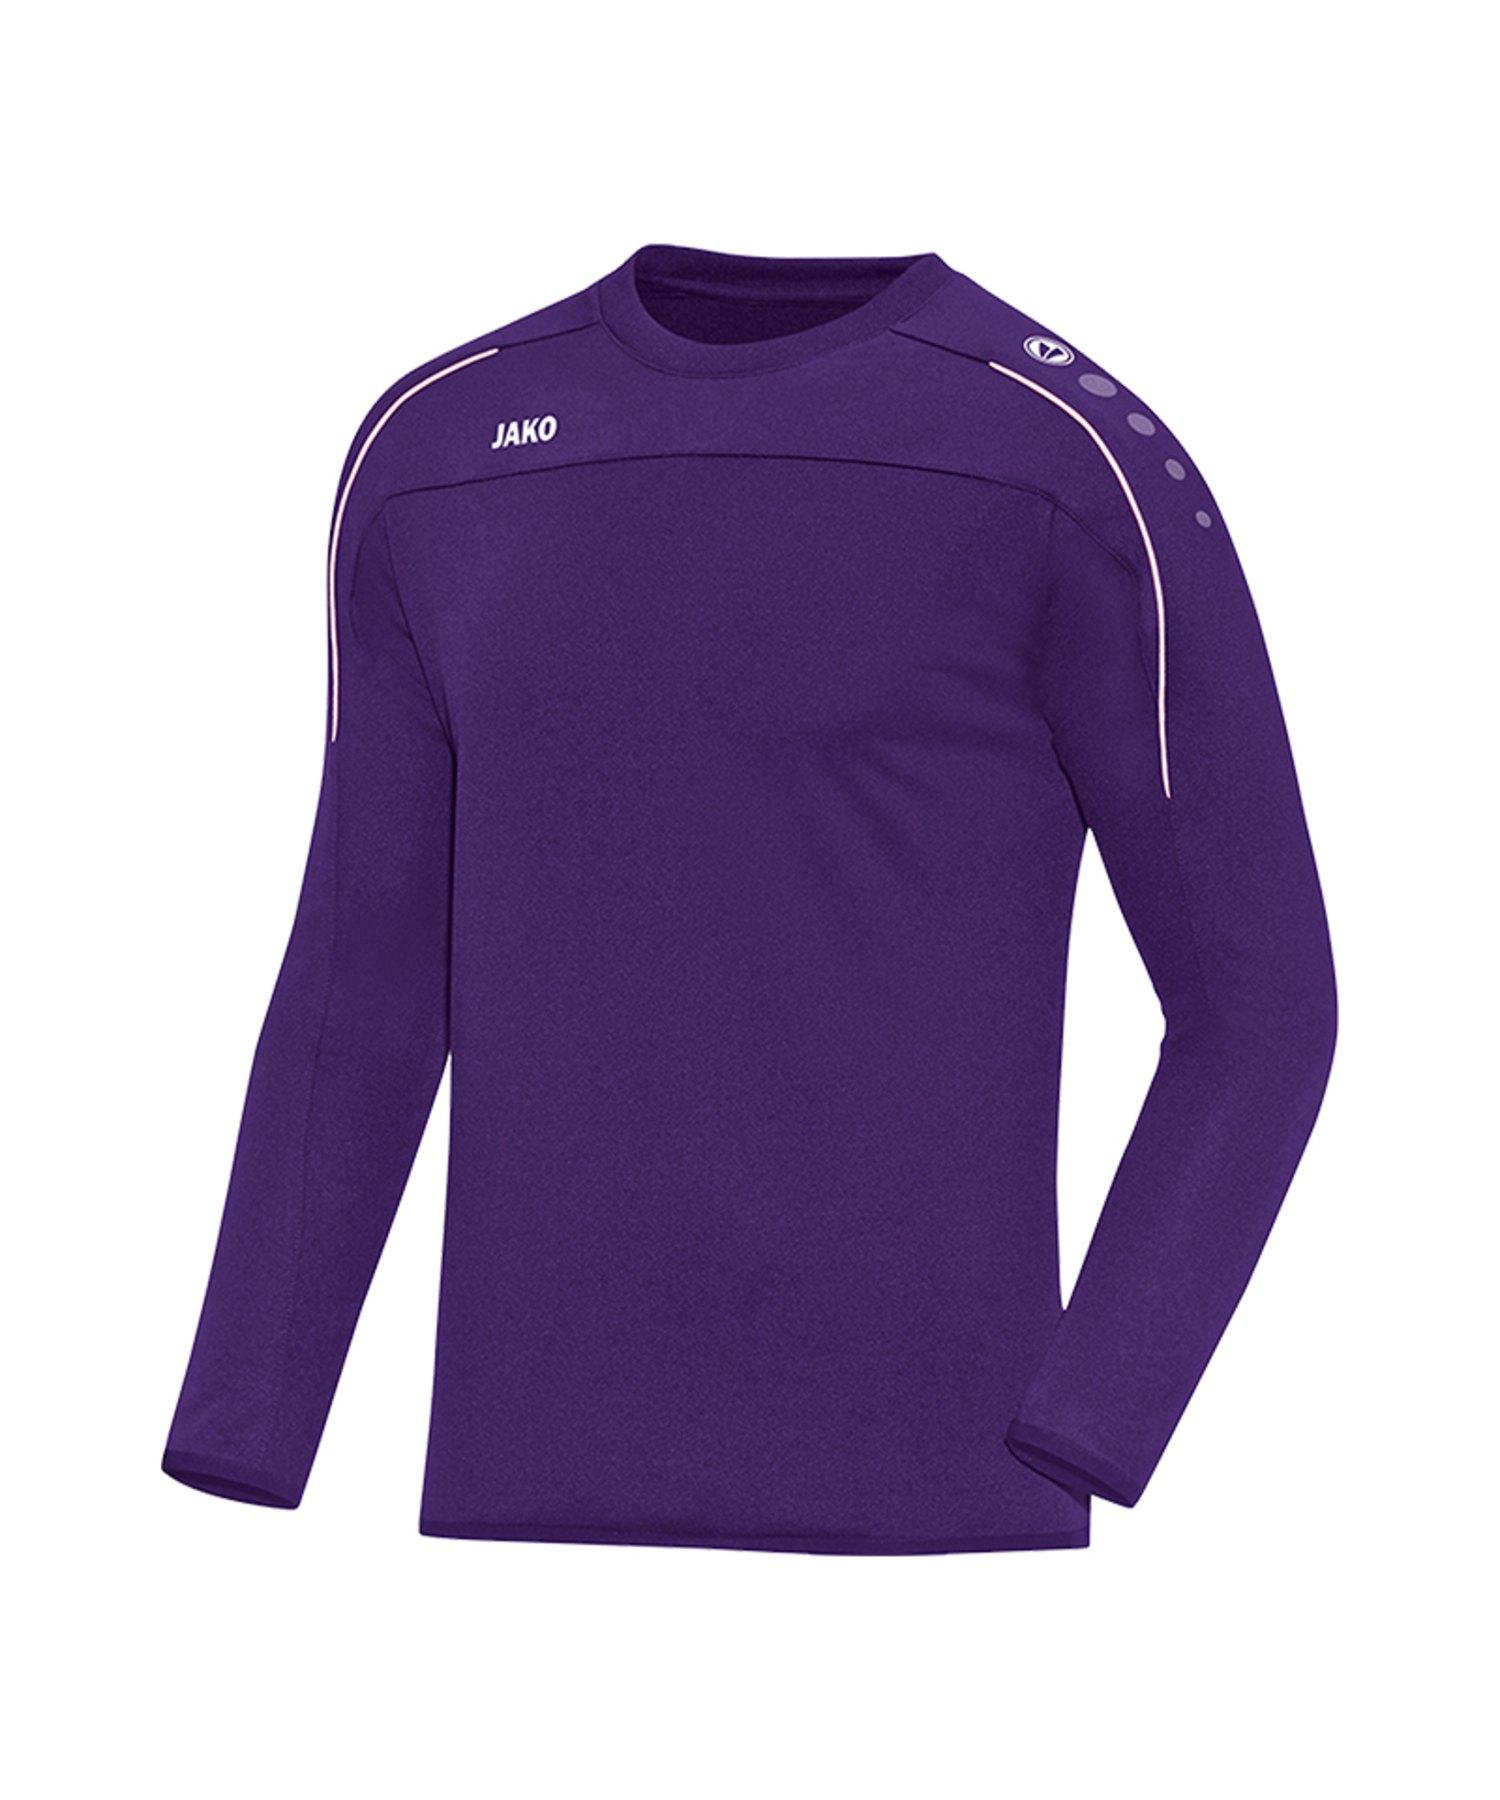 Jako Classico Sweatshirt Lila F10 - Lila